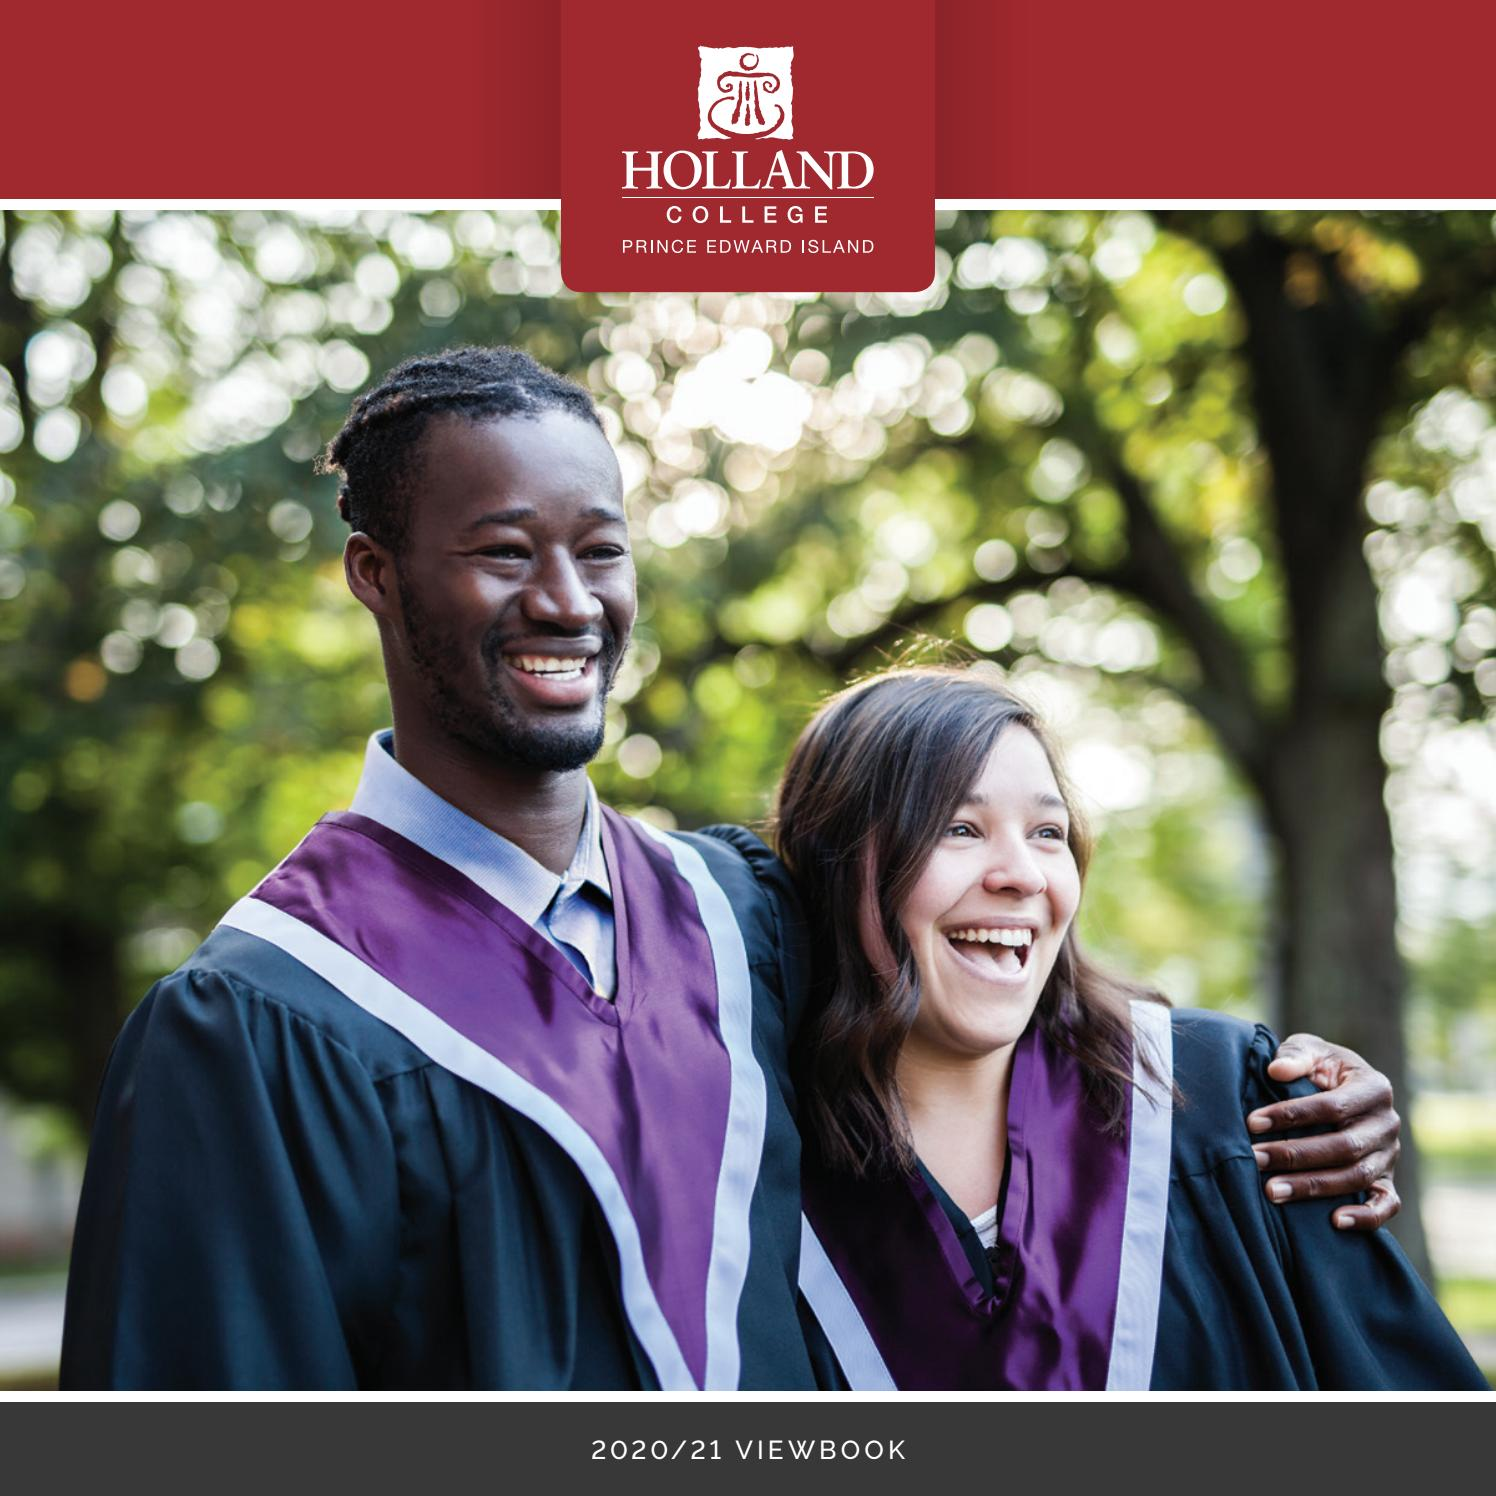 Tcc Graduation 2020.Holland College 2020 21 Viewbook By Holland College Issuu